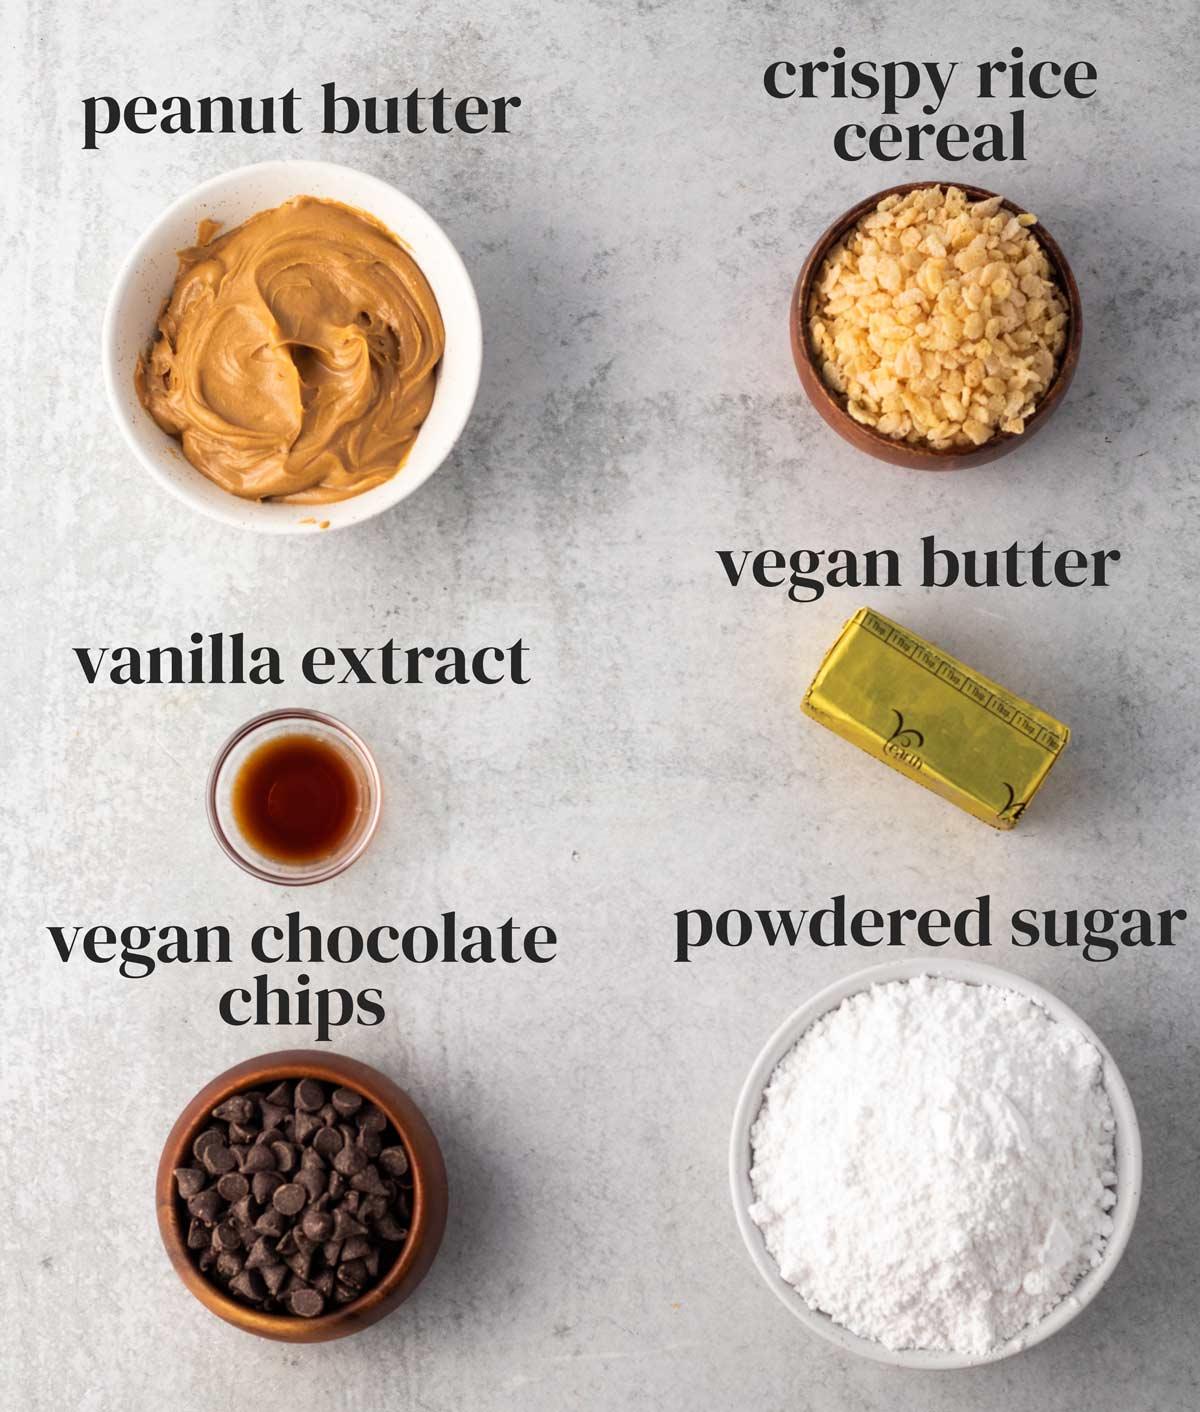 ingredients for vegan buckeyes in bowls on a countertop